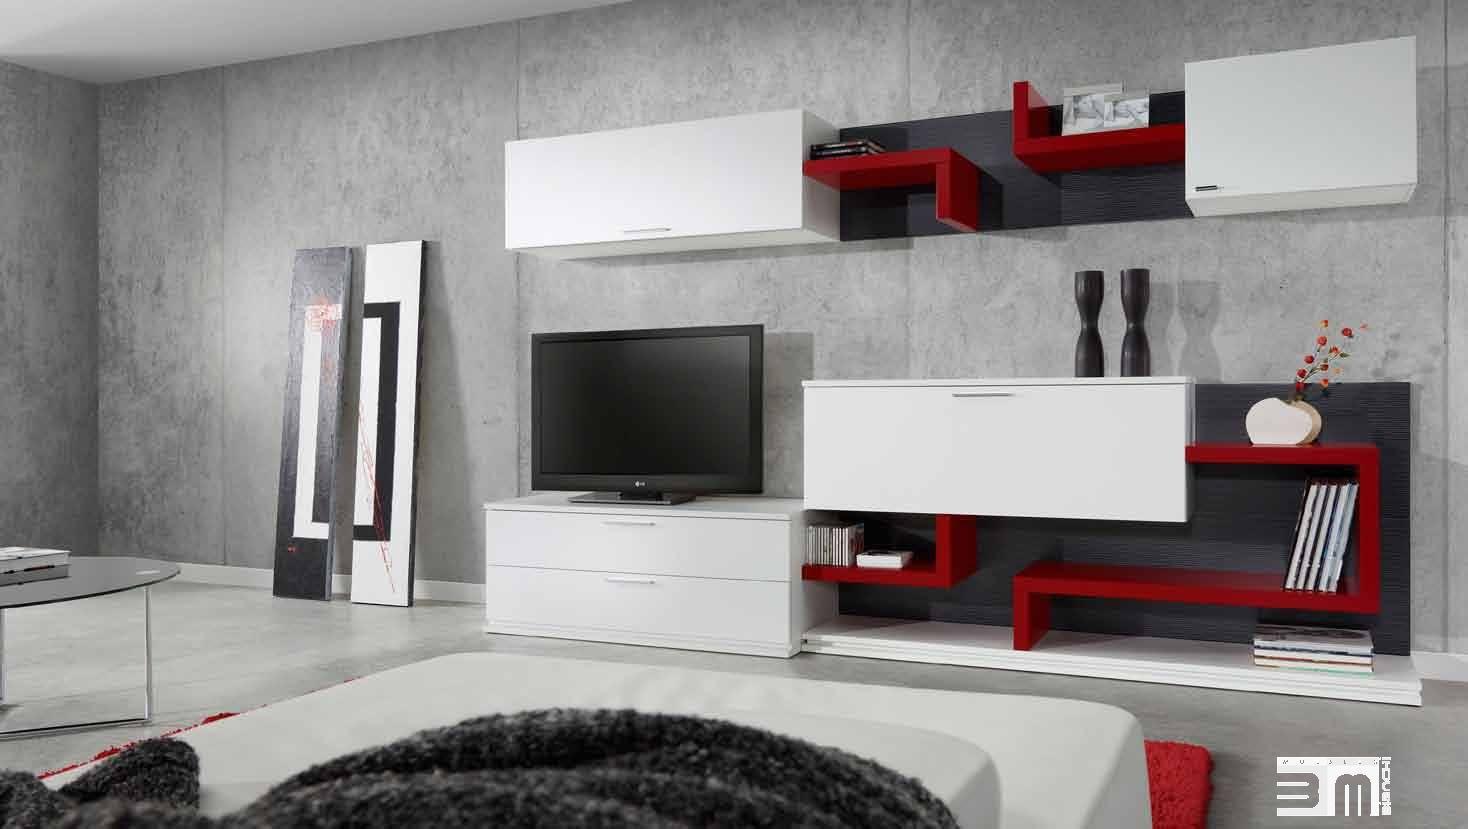 Qdk interiorismo salones - Interiorismo salones modernos ...